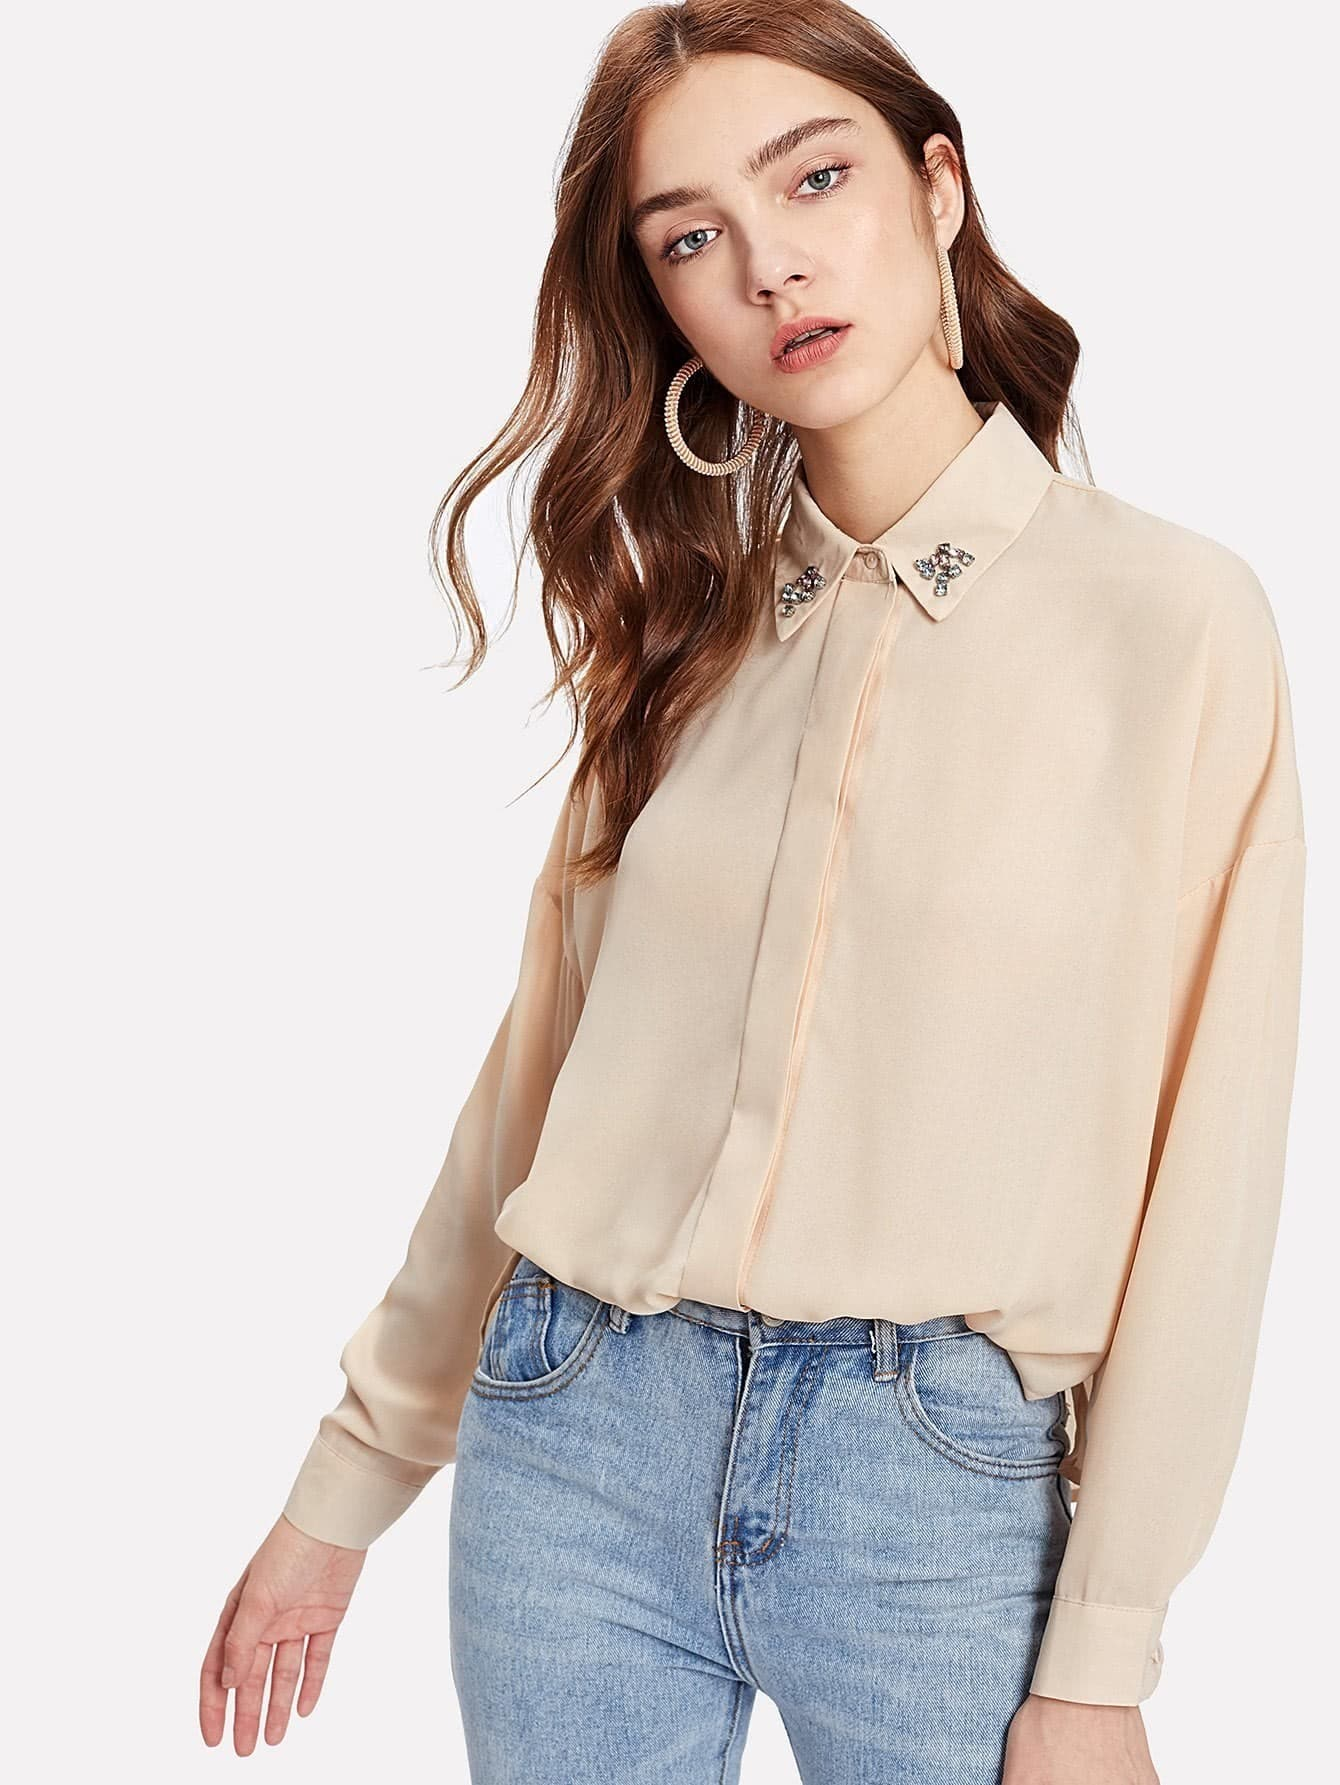 Faux Crystal Rhinestones Beaded Drop Shoulder Shirt